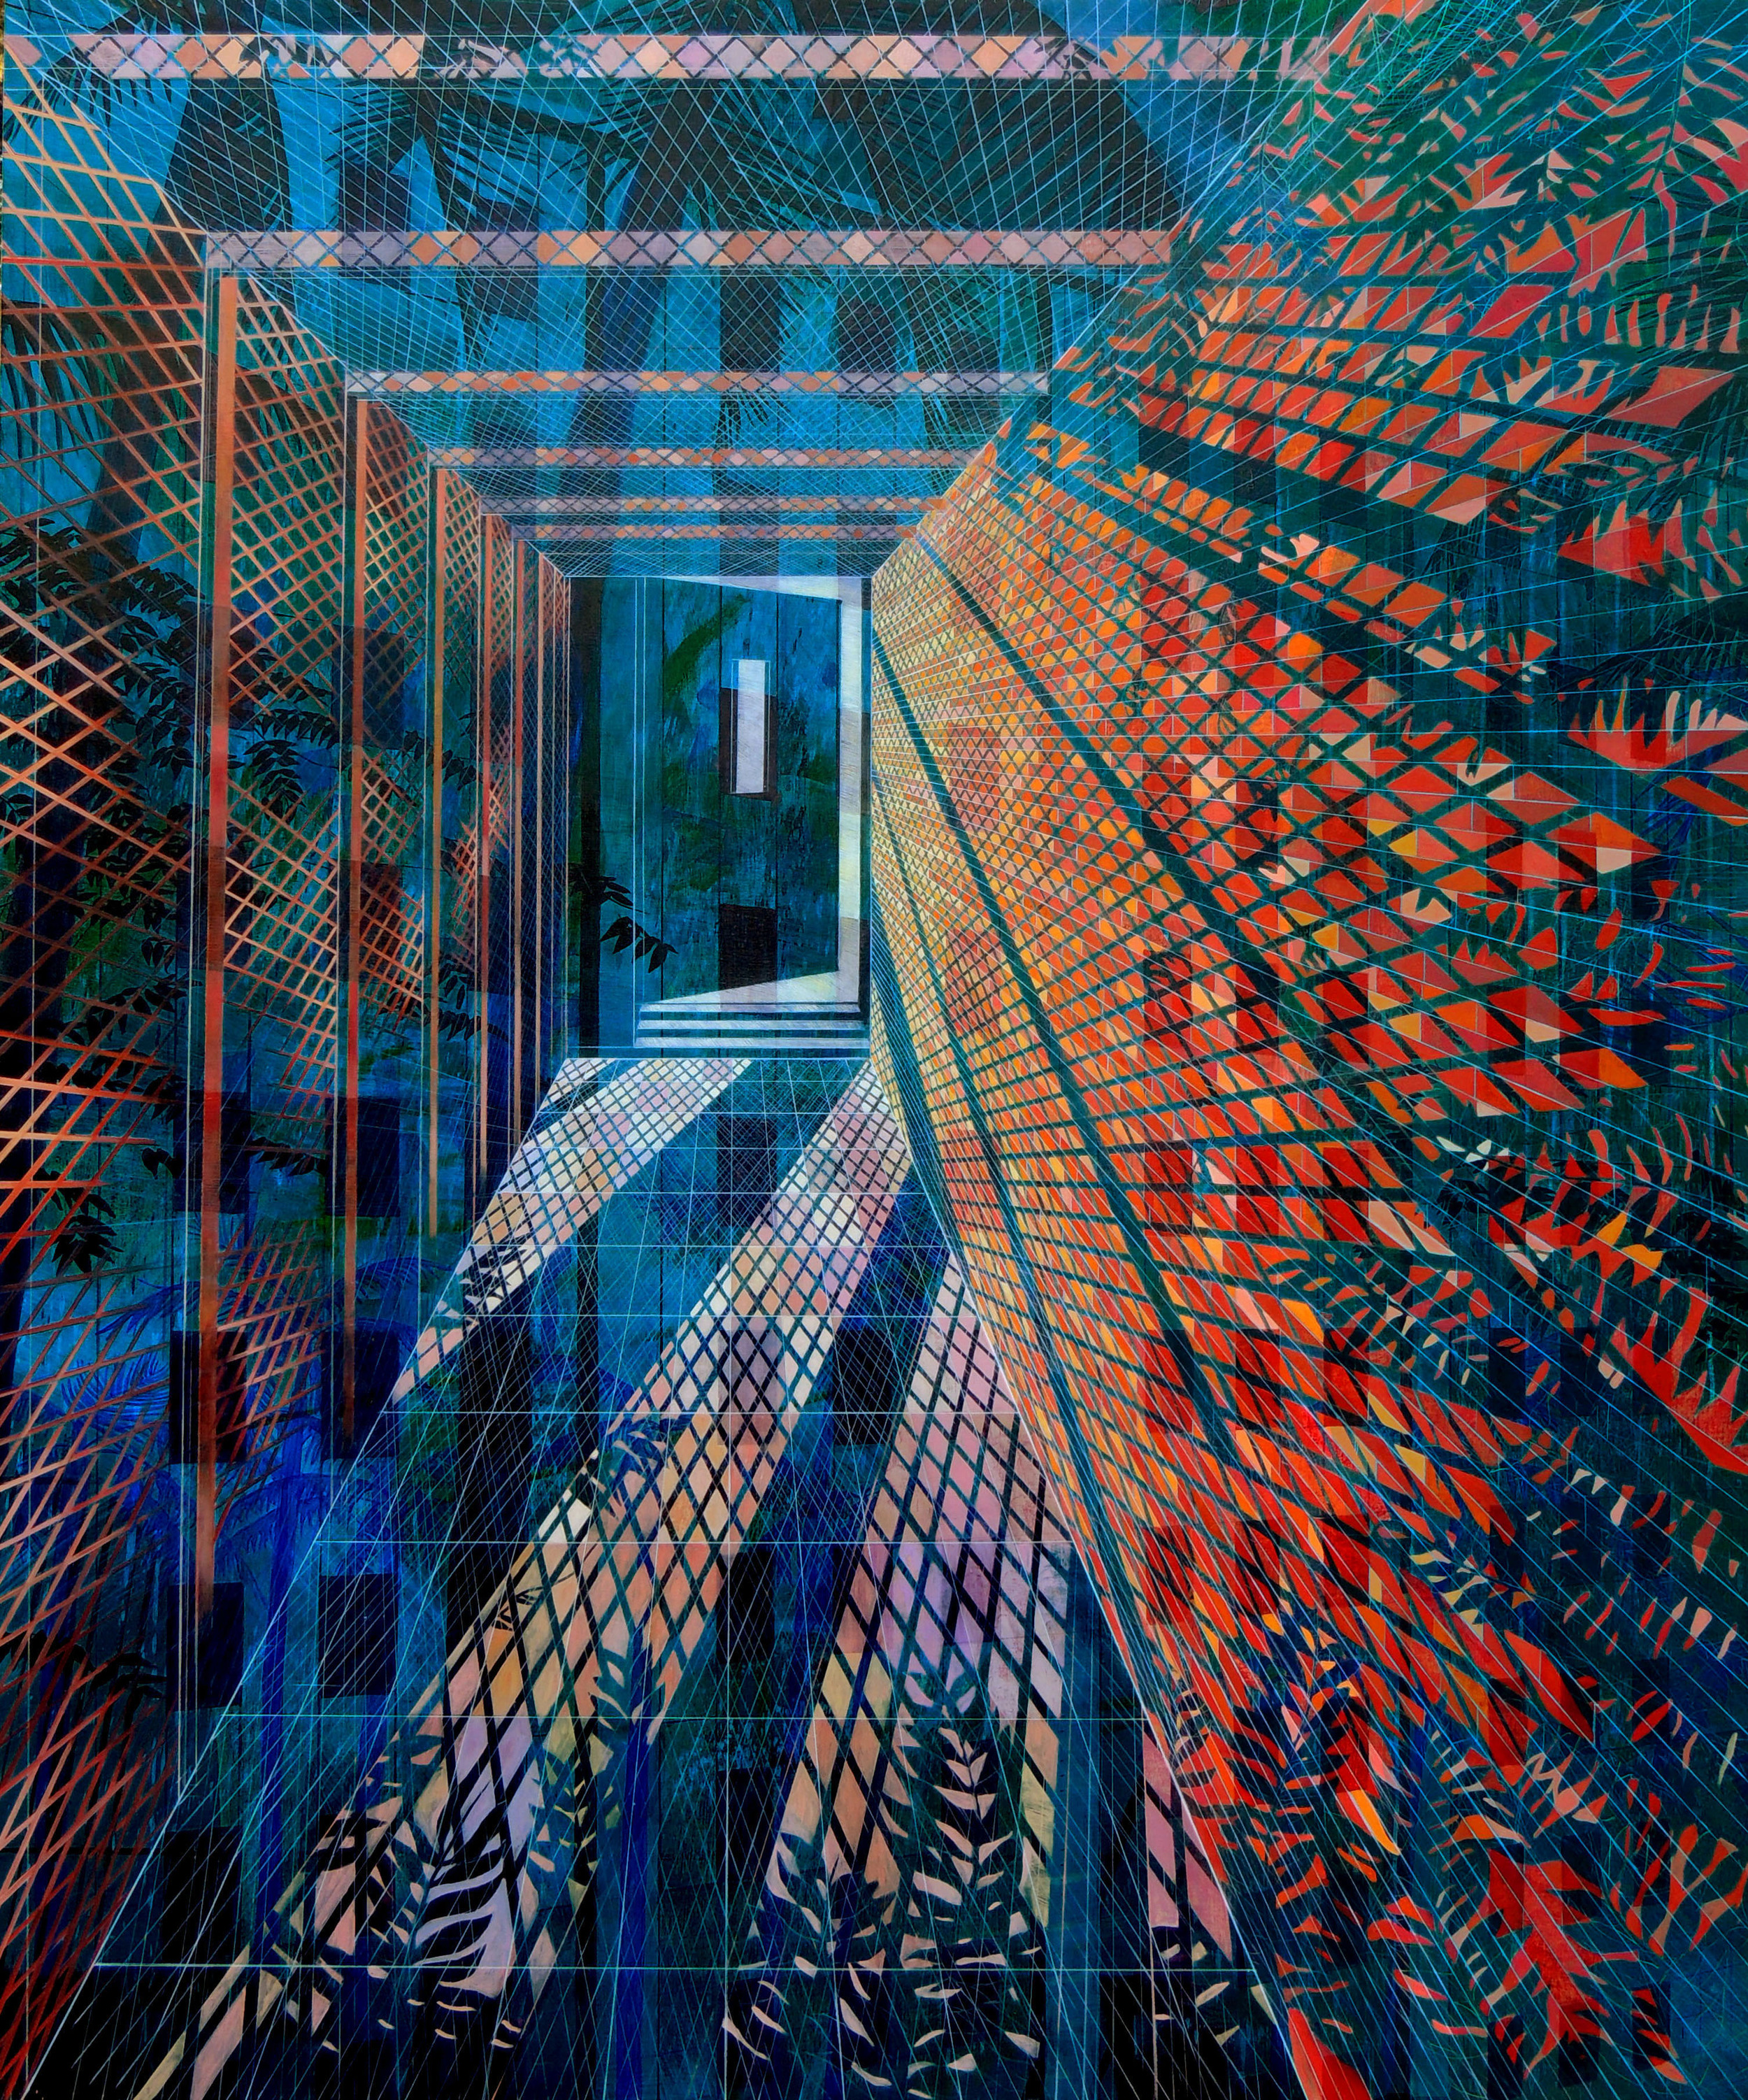 Isla Vista Dorms   72 x 60  Oil on Canvas  2014